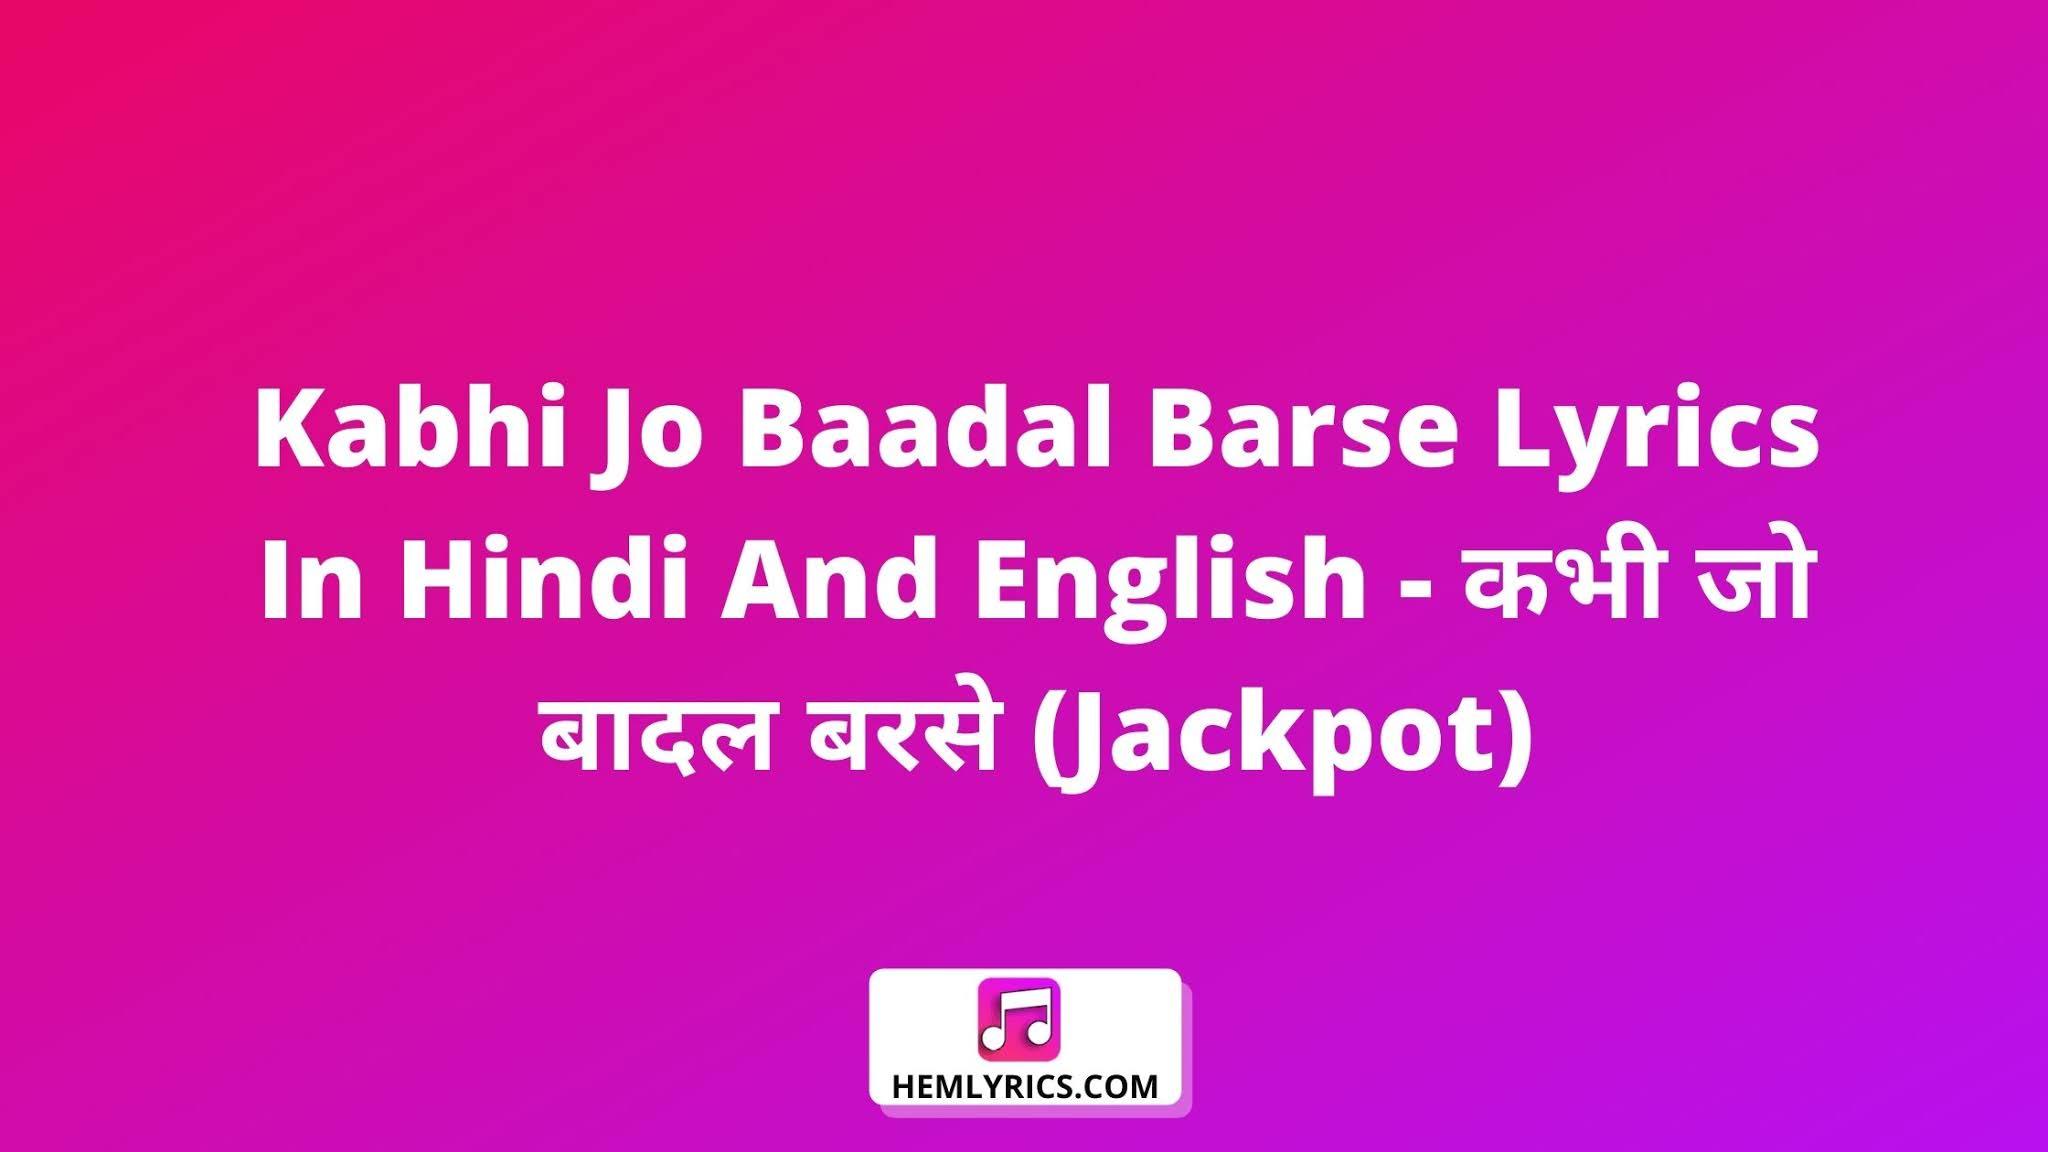 Kabhi Jo Baadal Barse Lyrics In Hindi And English - कभी जो बादल बरसे (Jackpot)